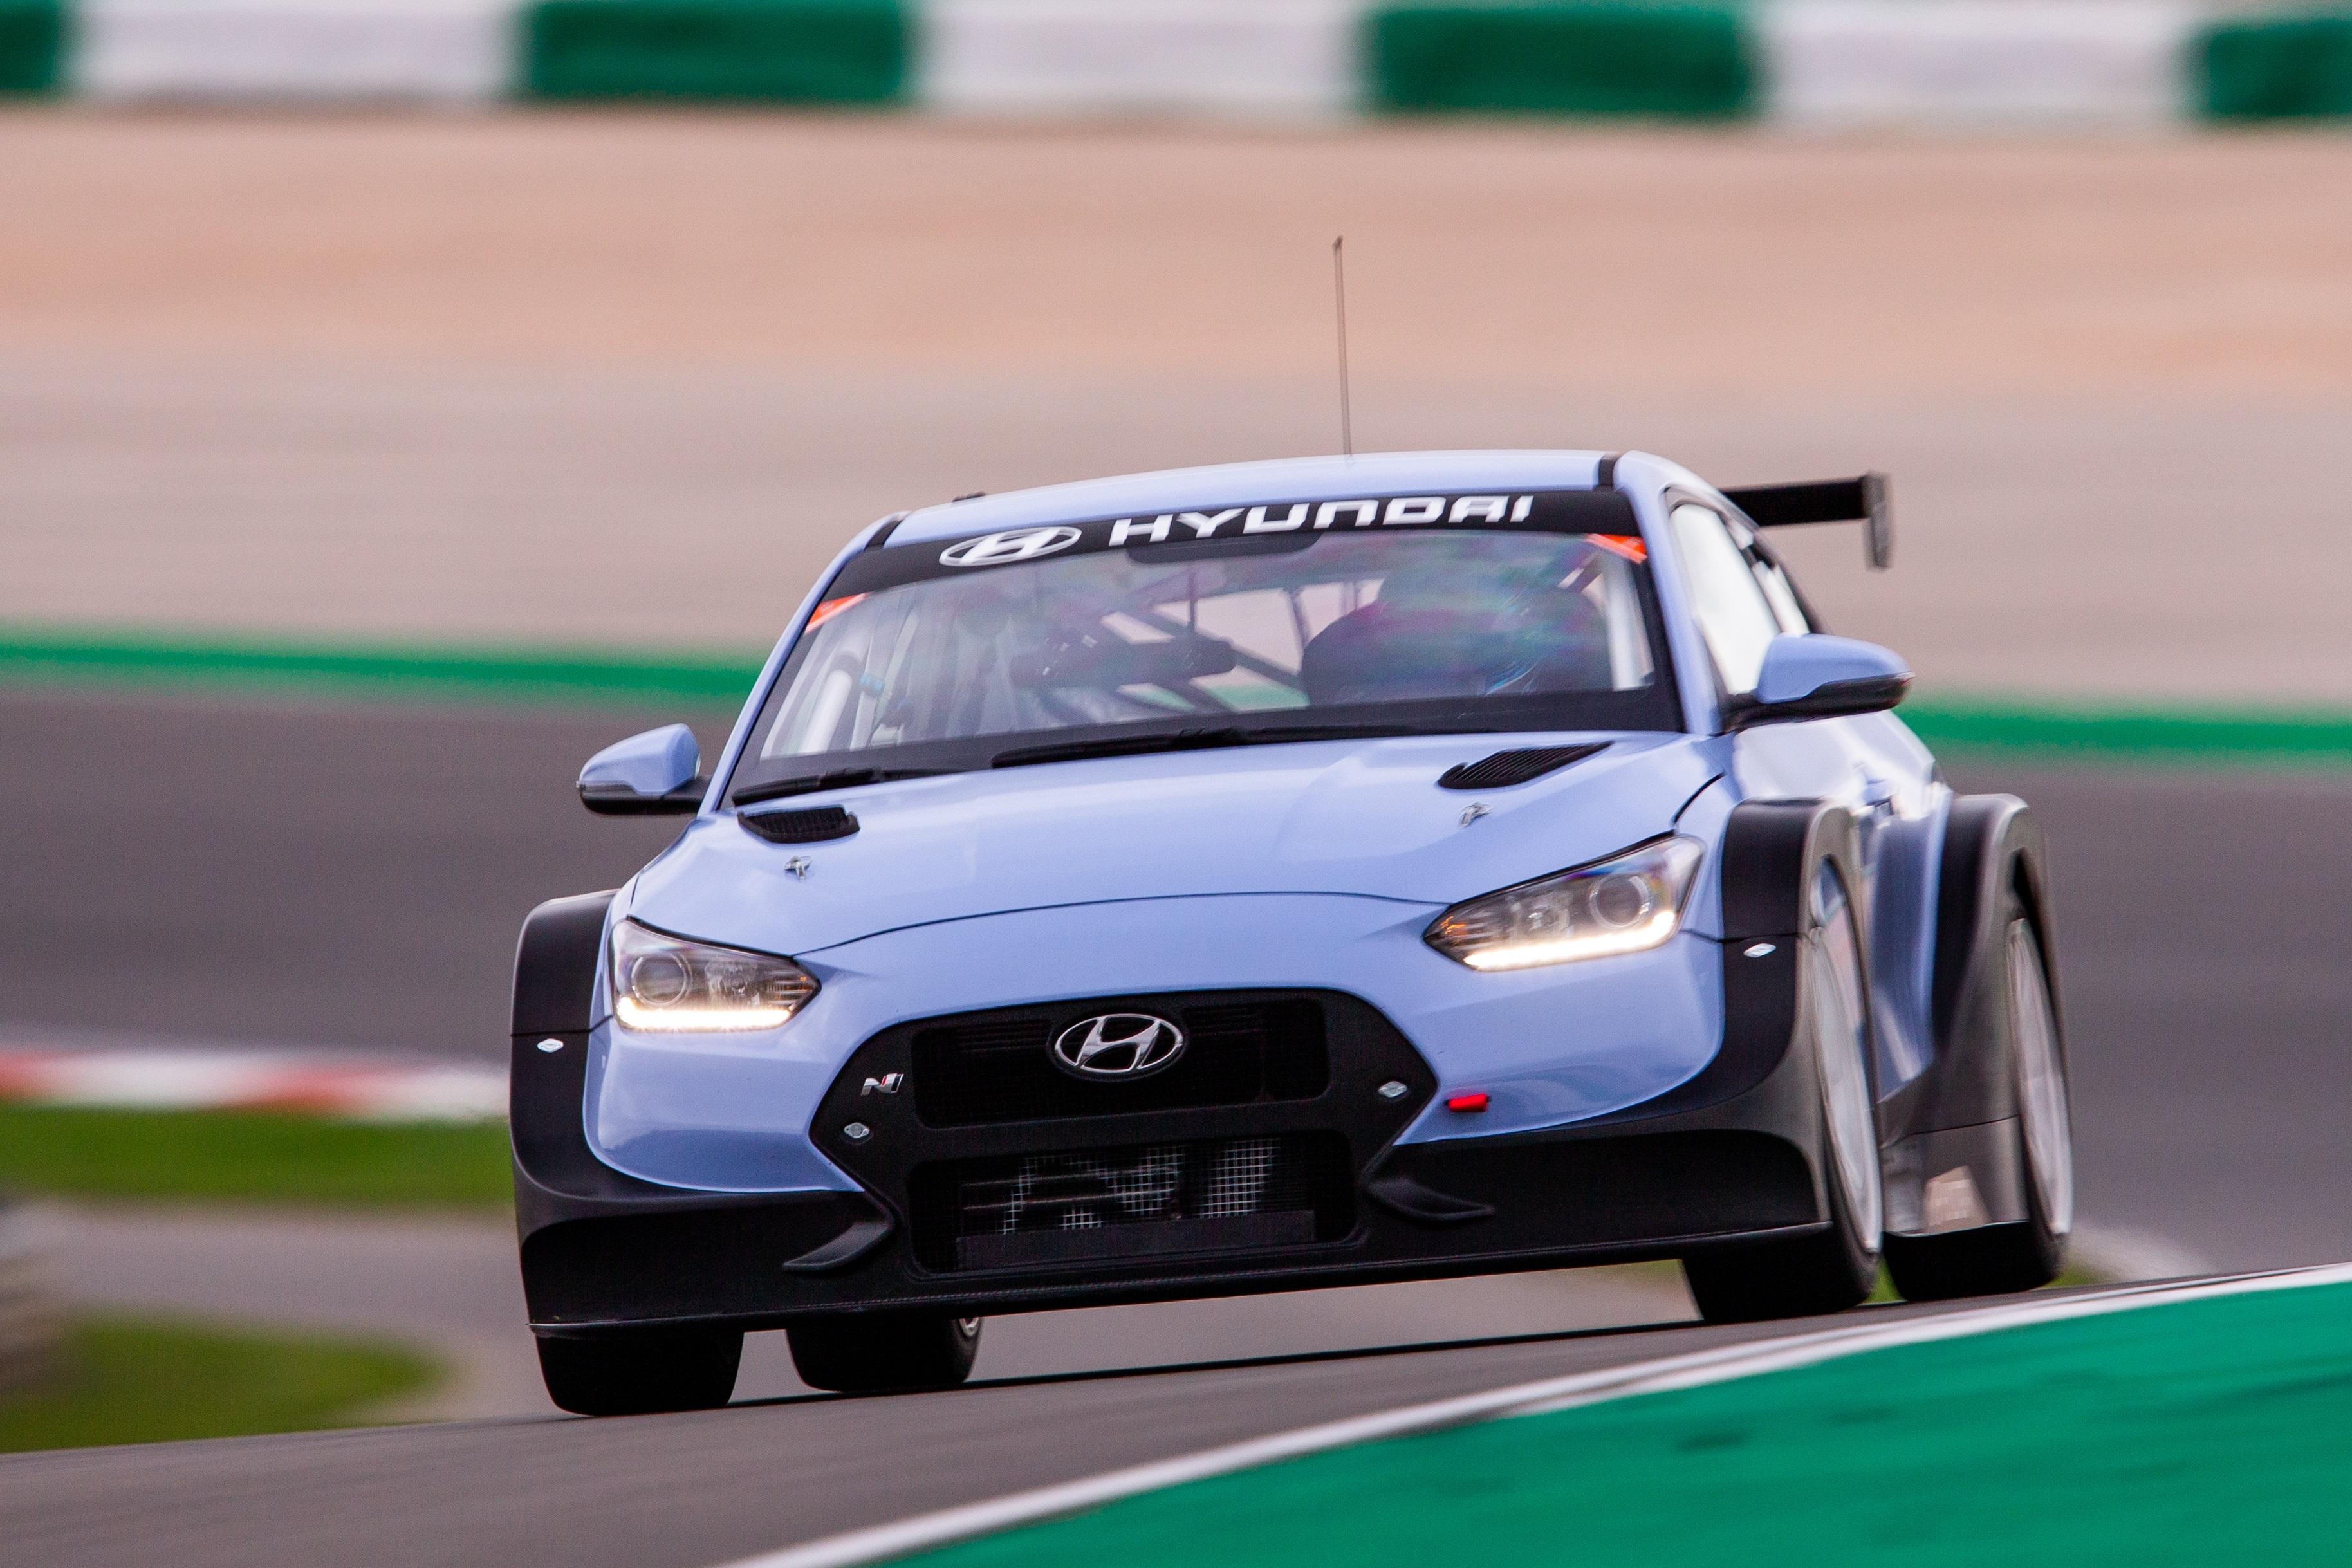 Michael Lewis Returns To Bryan Herta Autosport For IMSA Competition